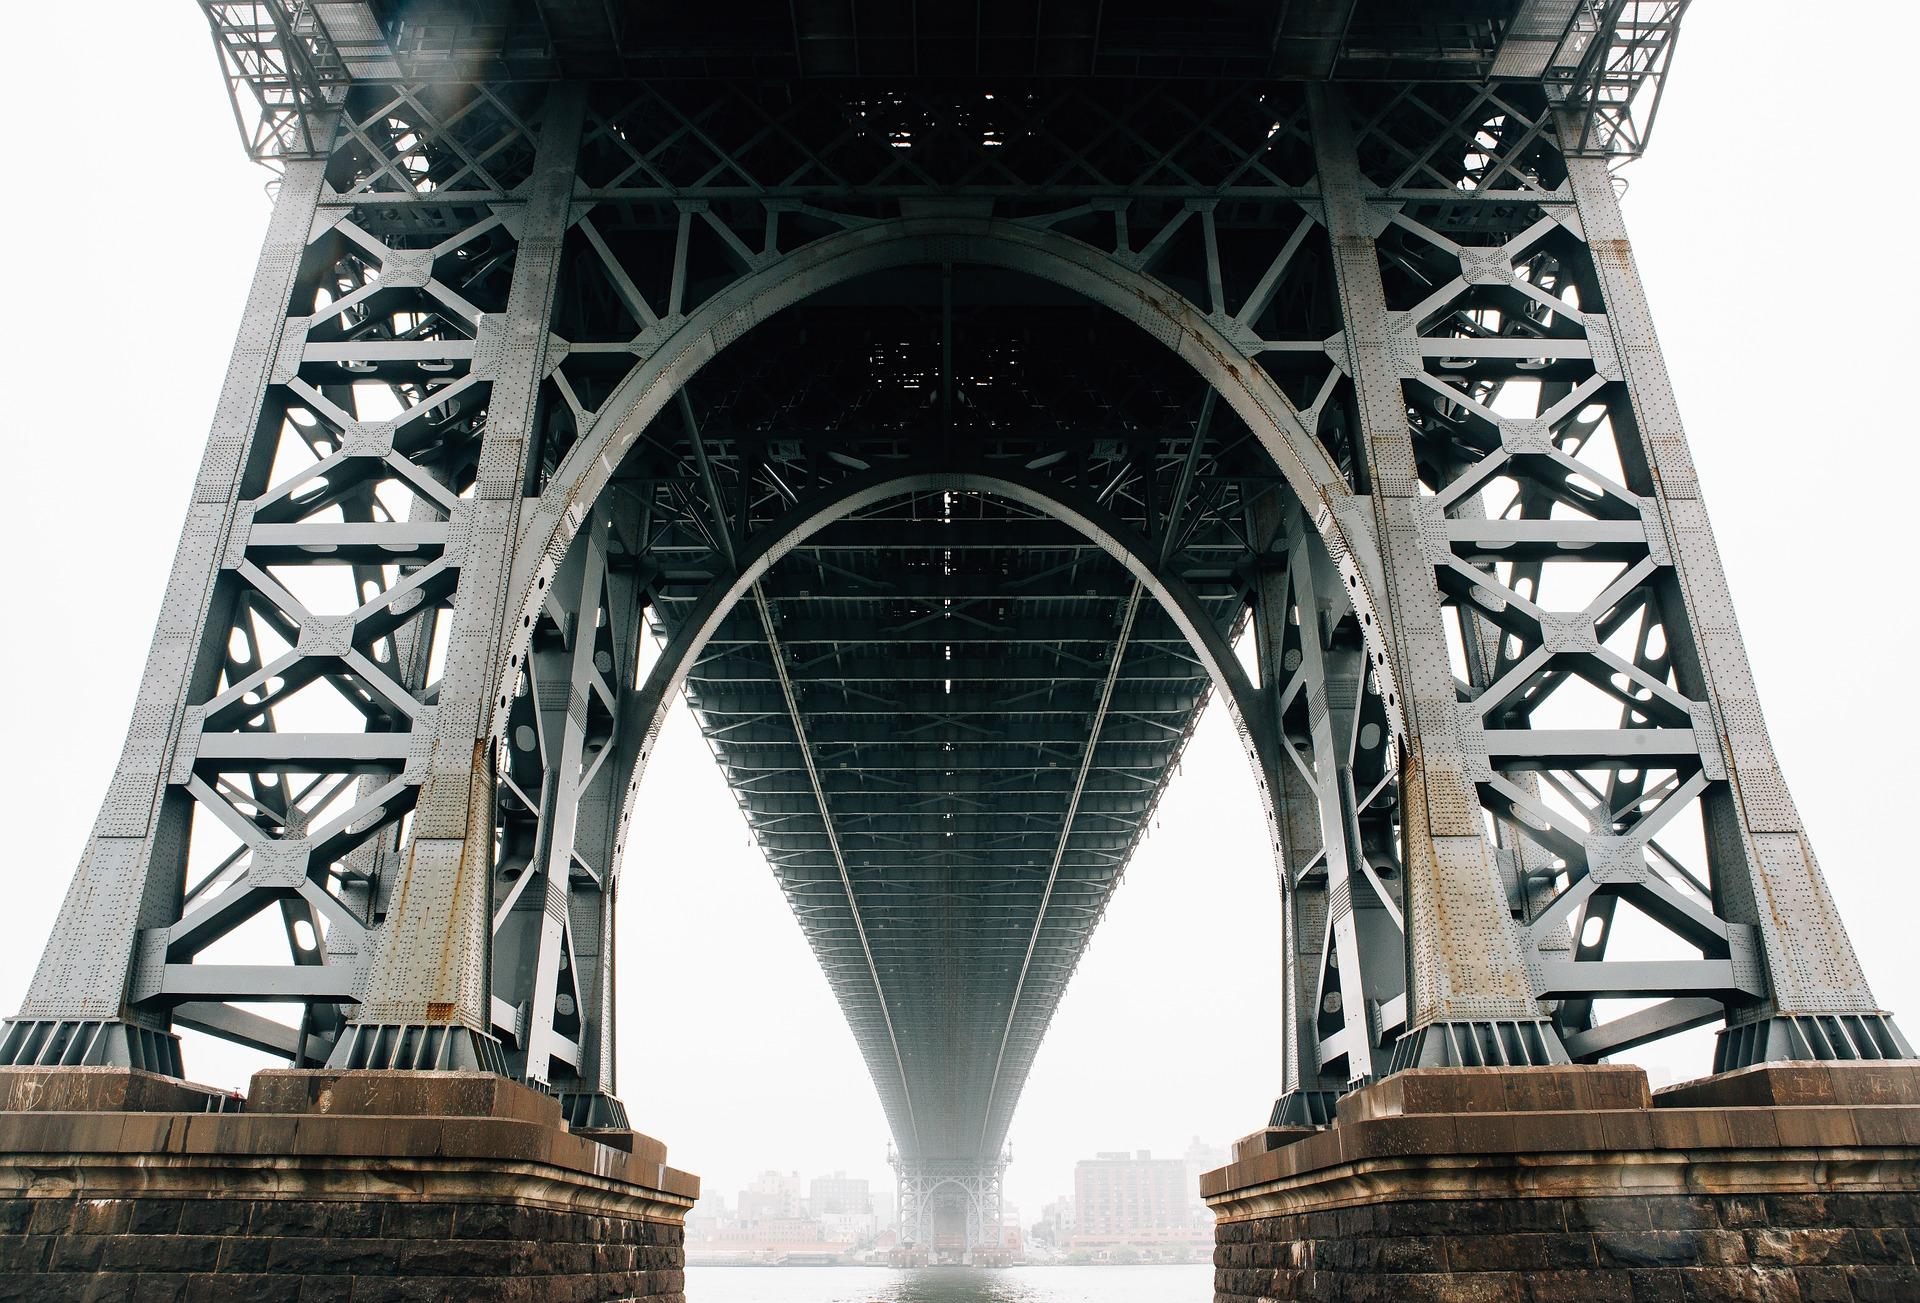 Bridges & Engineering Structures